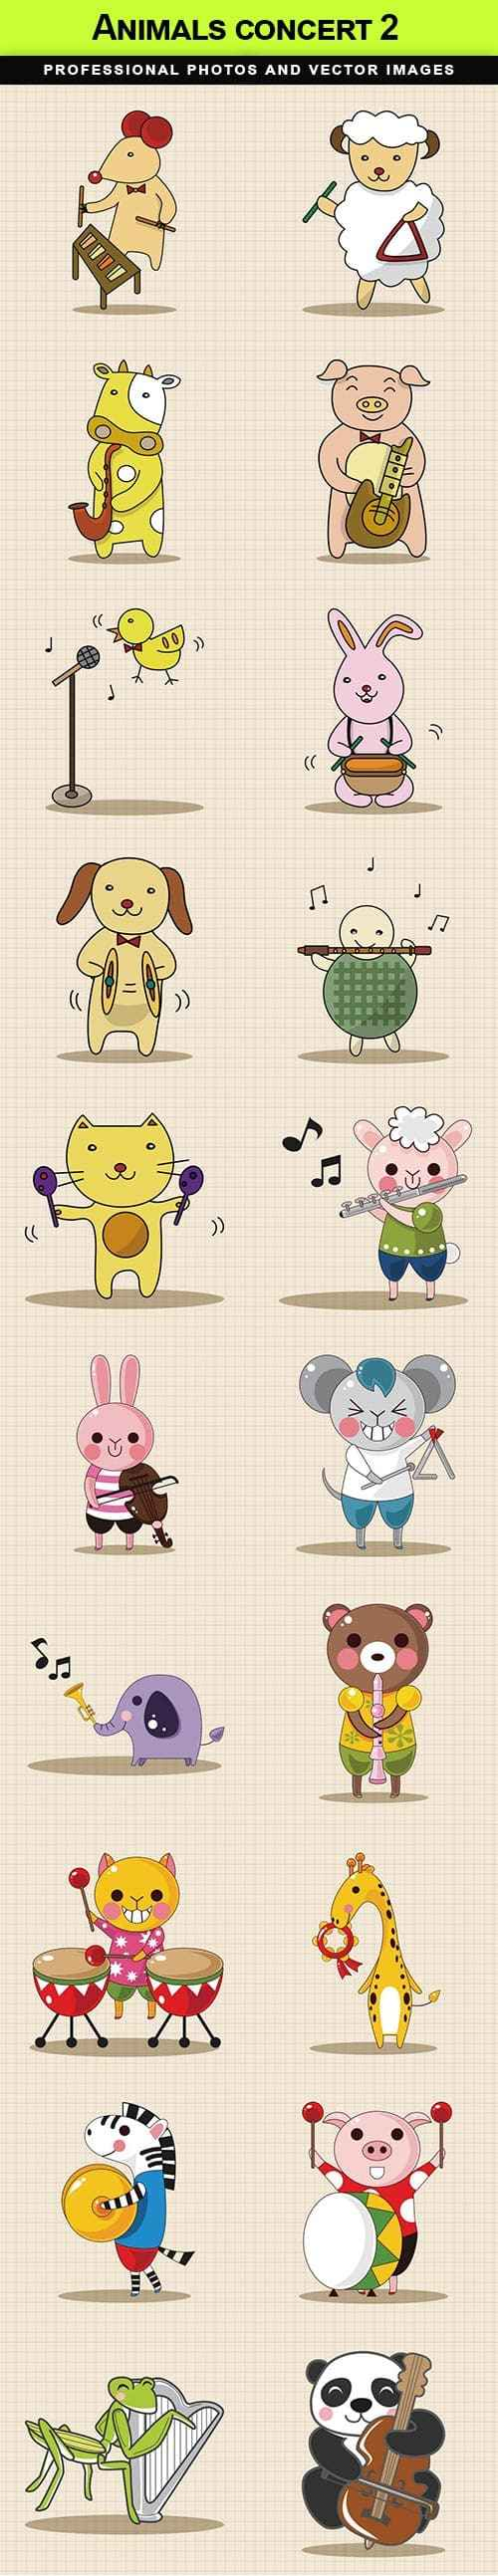 Animals concert 2